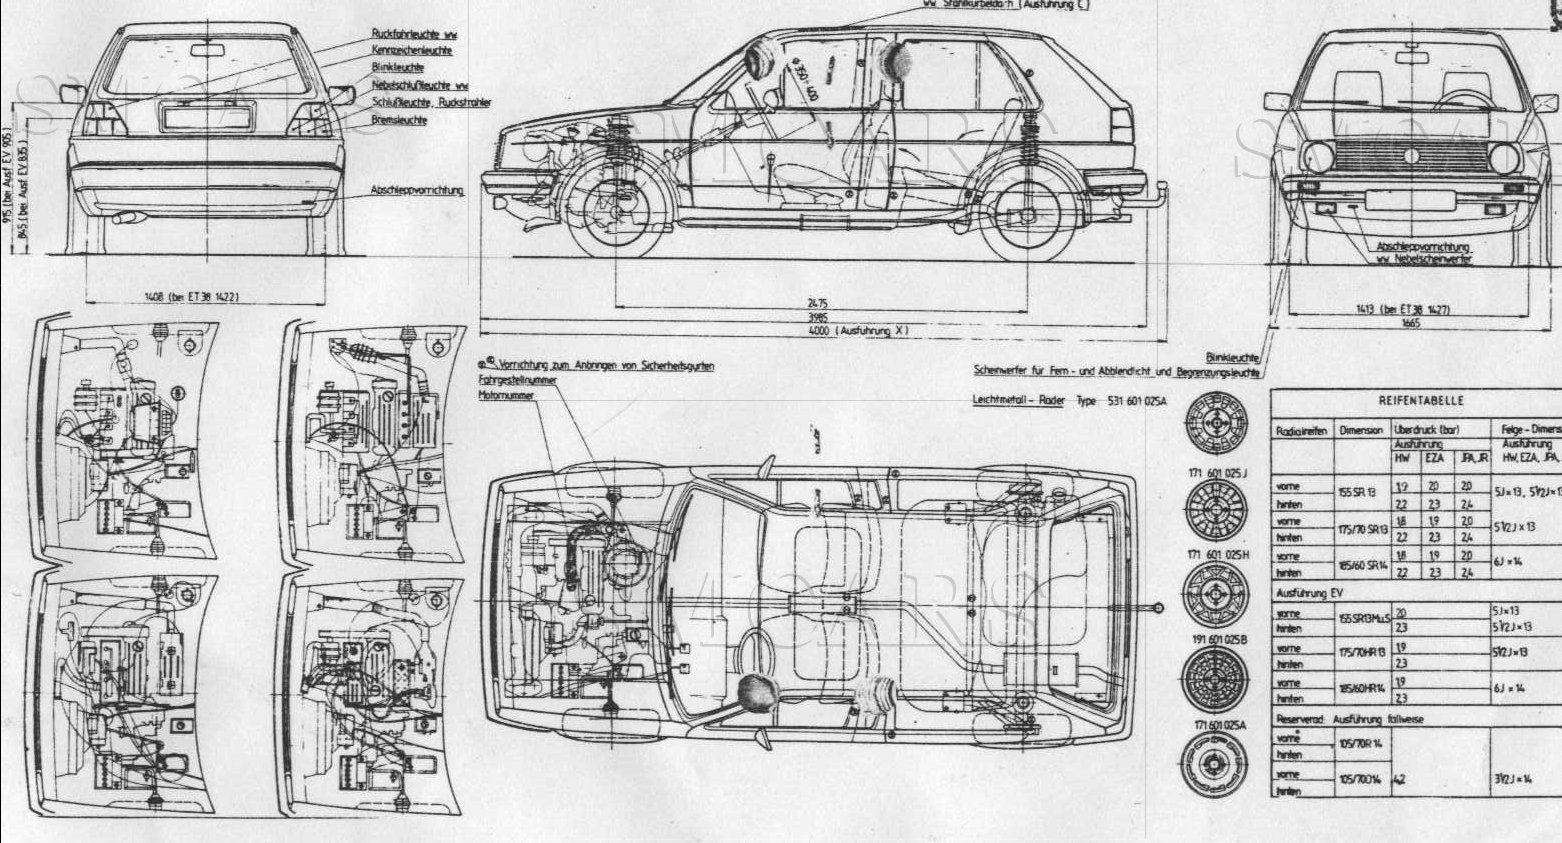 2005 Vw Beetle Engine Diagram Schematic Diagrams Pt Cruiser Mk2 8v Wiring Services U2022 Chrysler